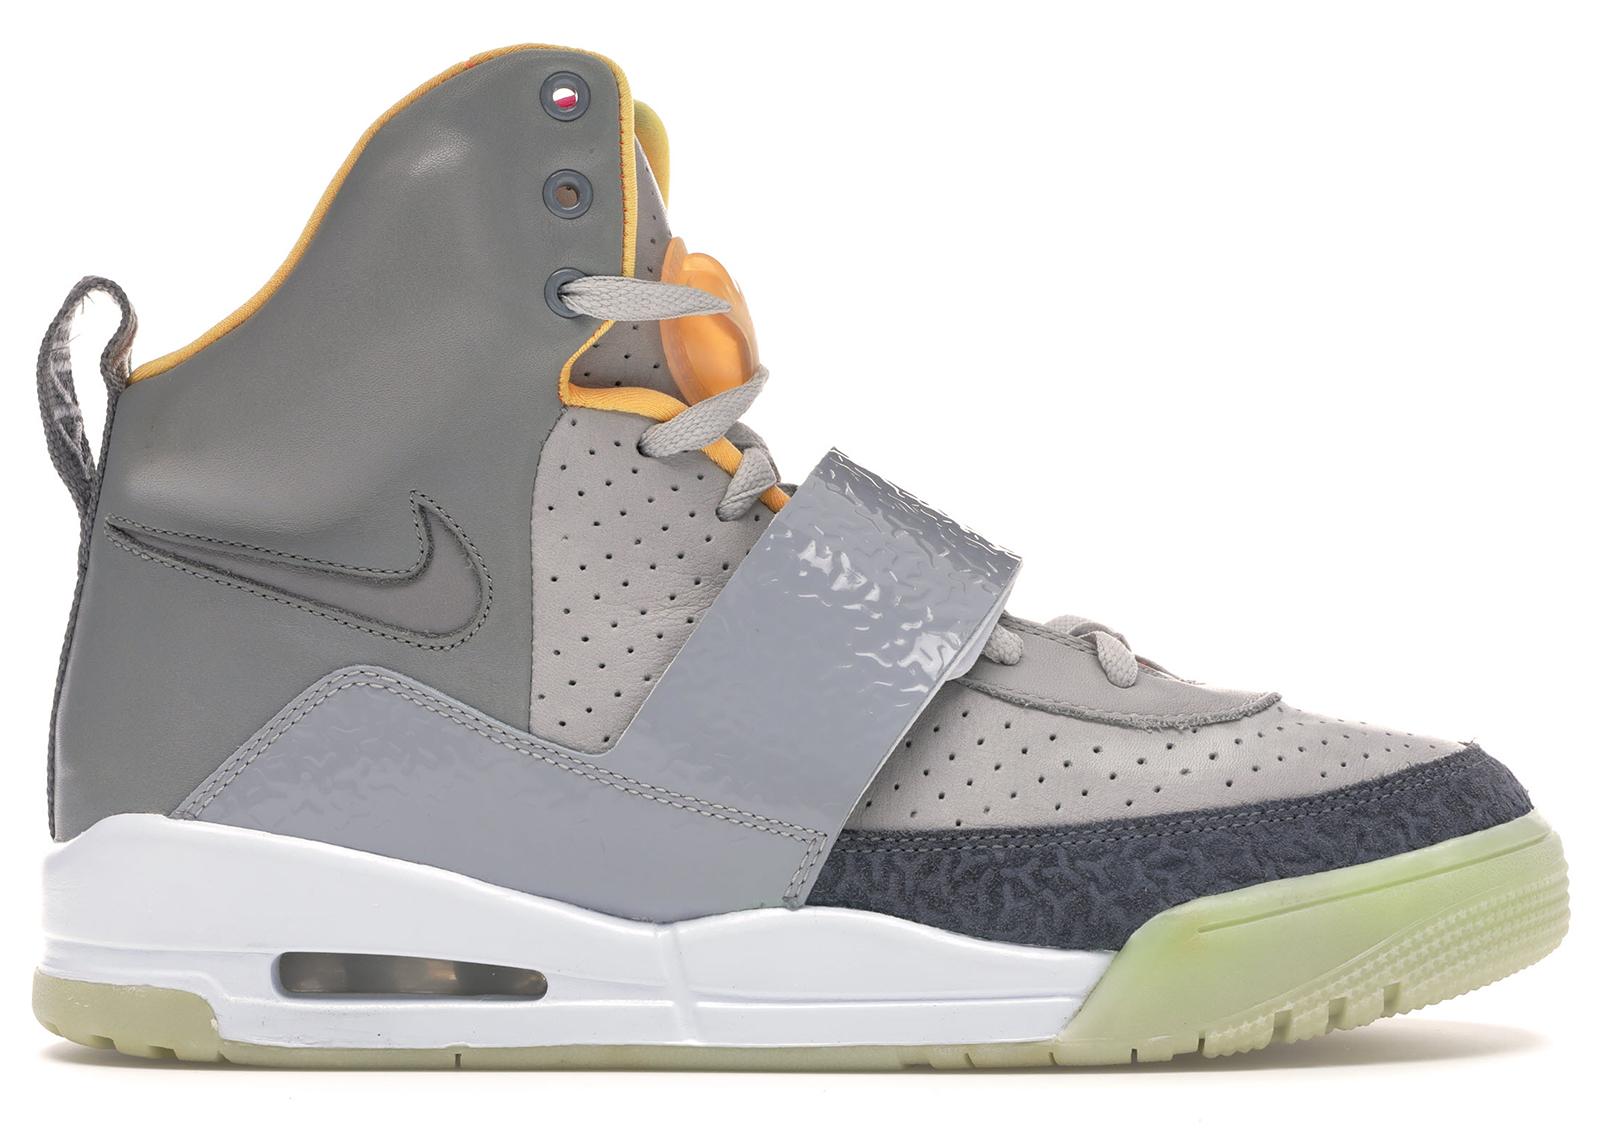 Nike Air Yeezy 1 Zen Grey - 366164-002